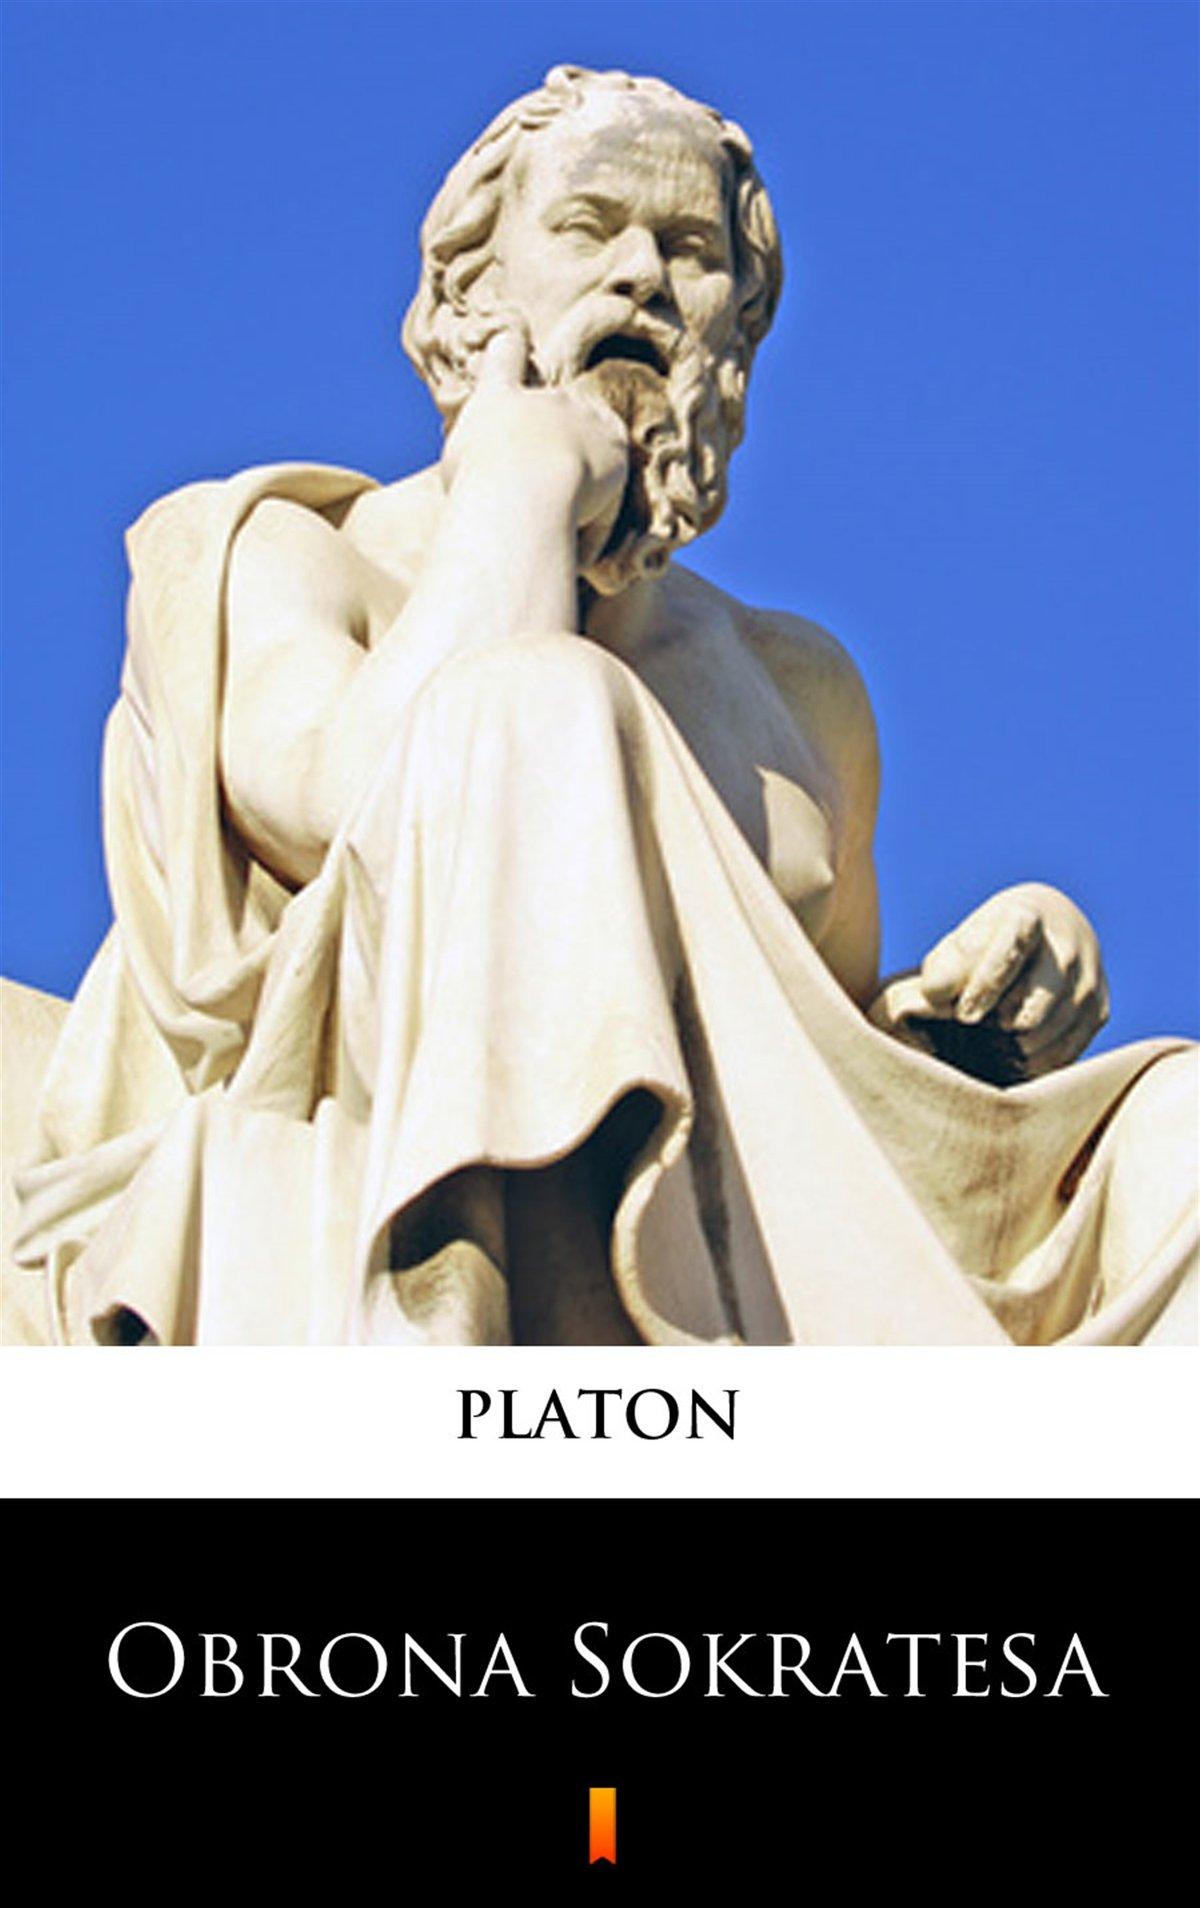 Obrona Sokratesa - Ebook (Książka na Kindle) do pobrania w formacie MOBI